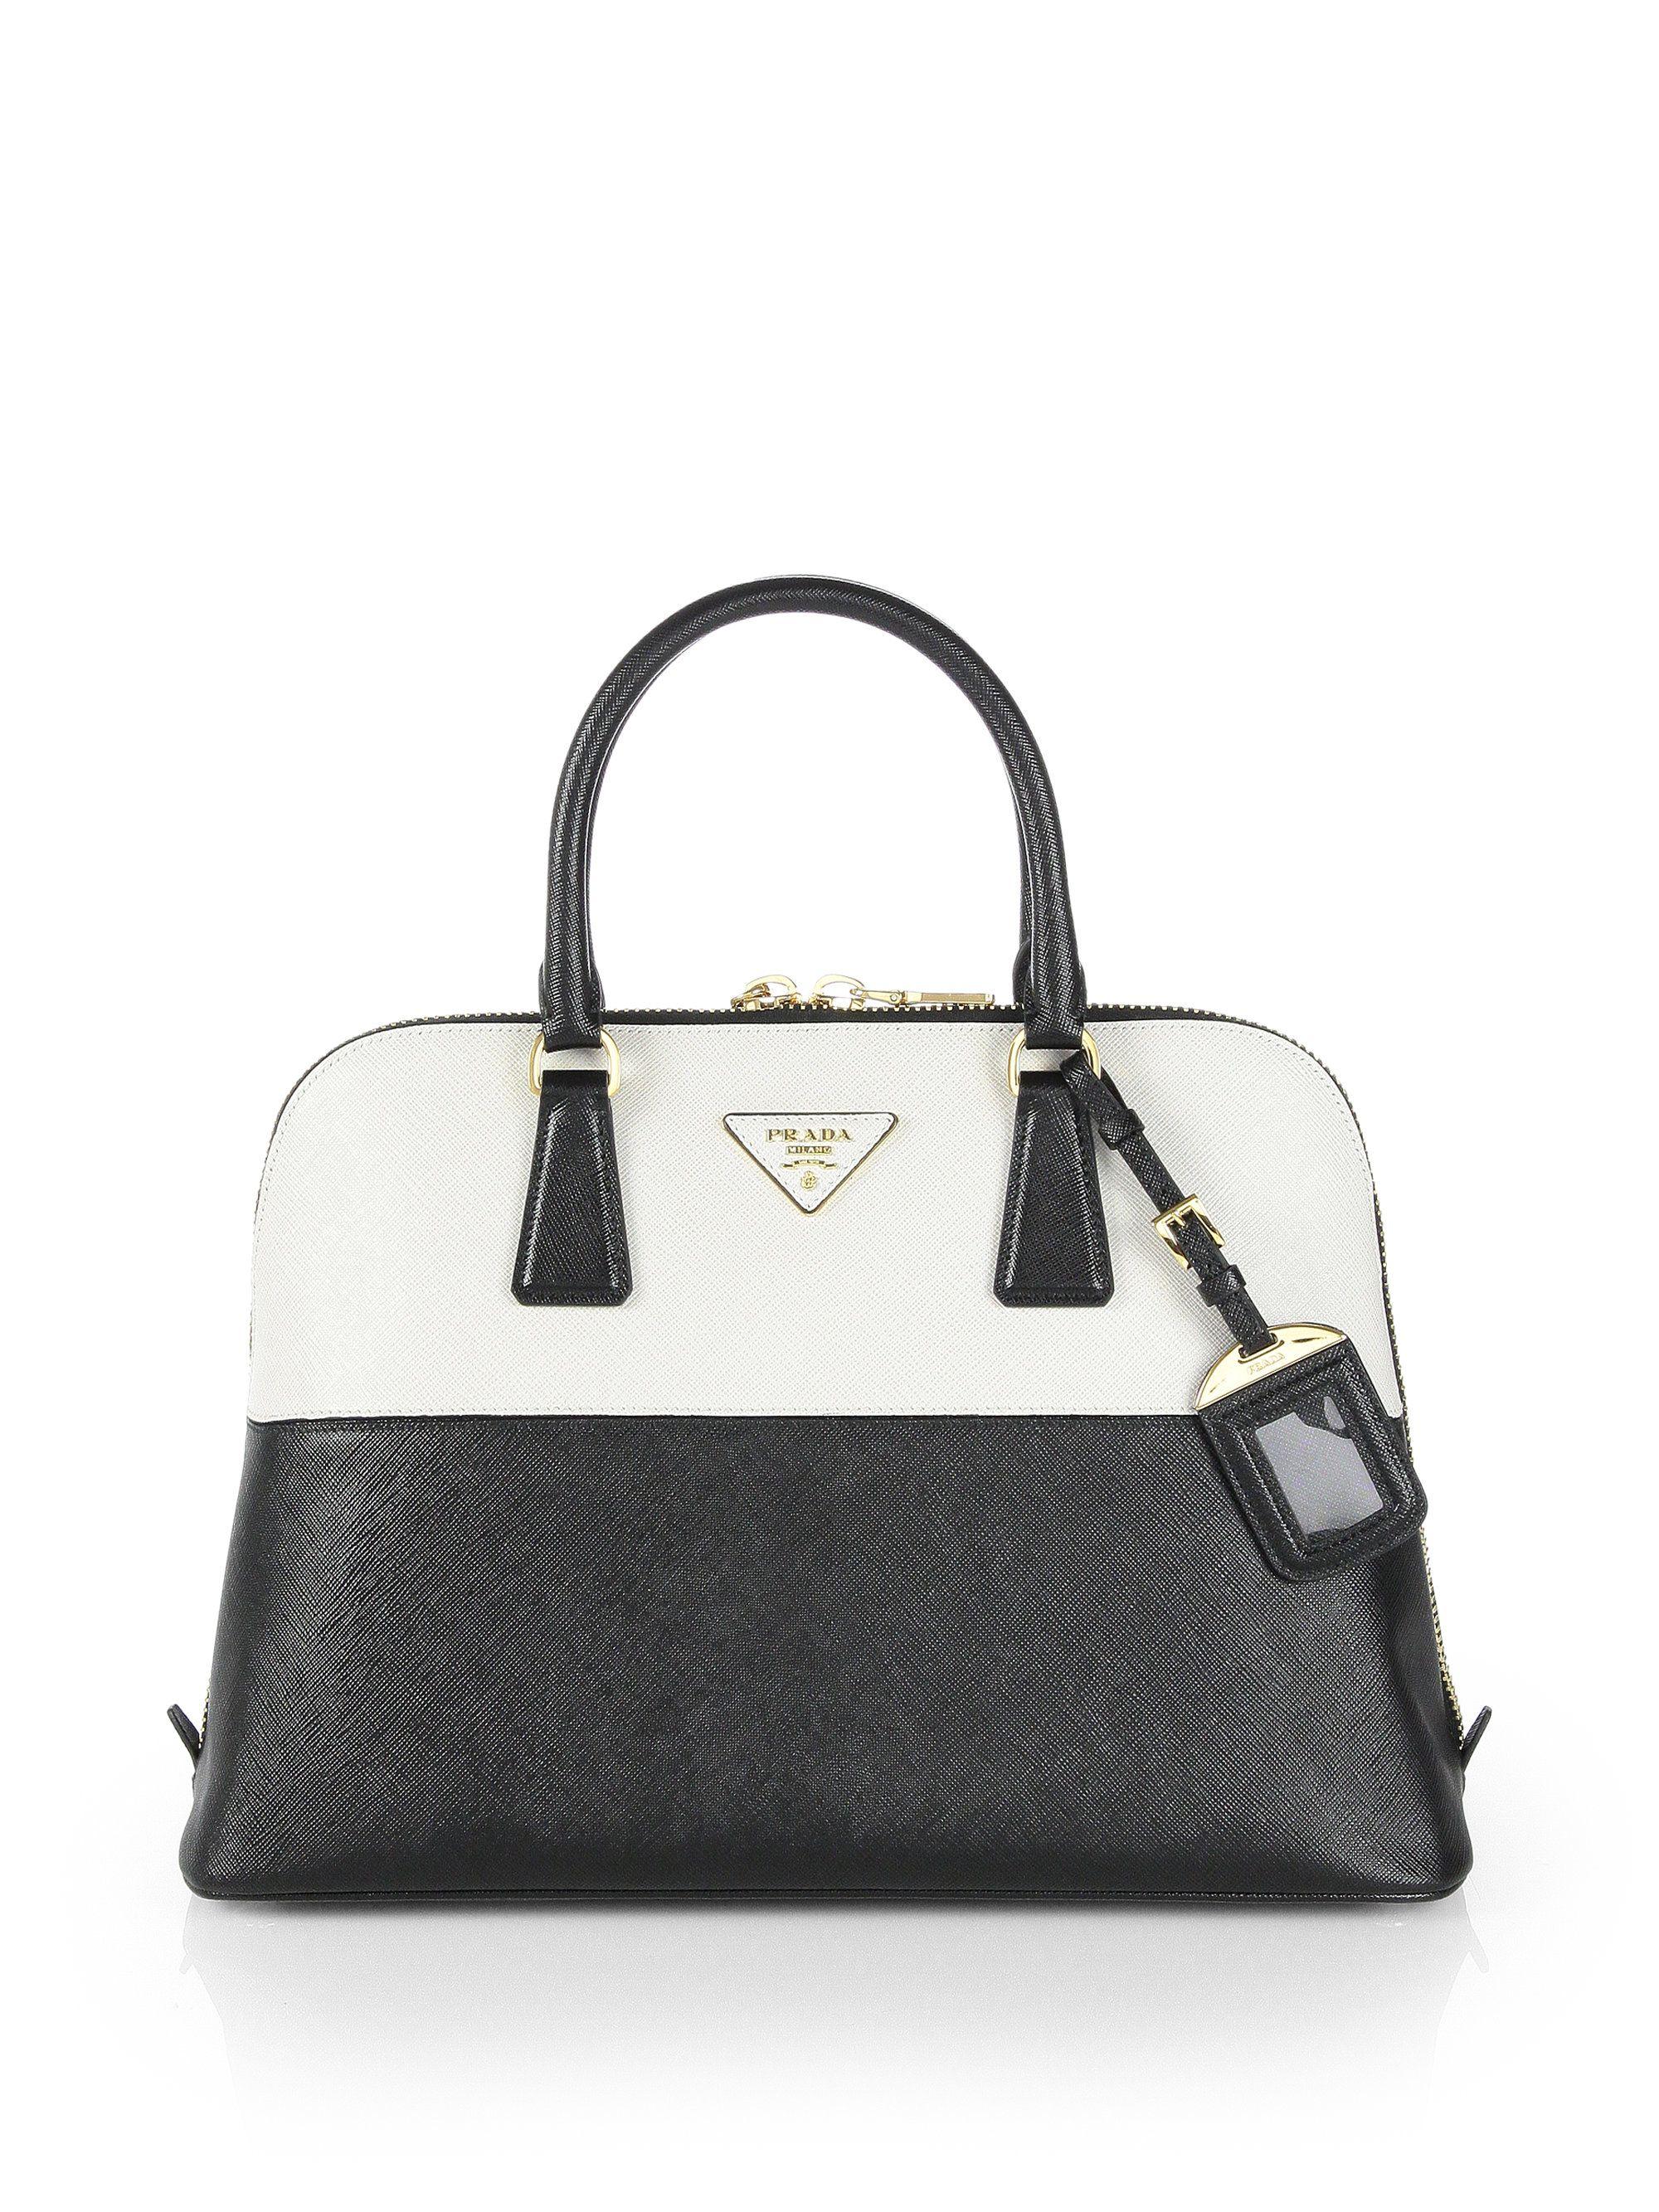 049638d94683 Prada Saffiano Bicolor Promenade Bag in Black (nero-black)